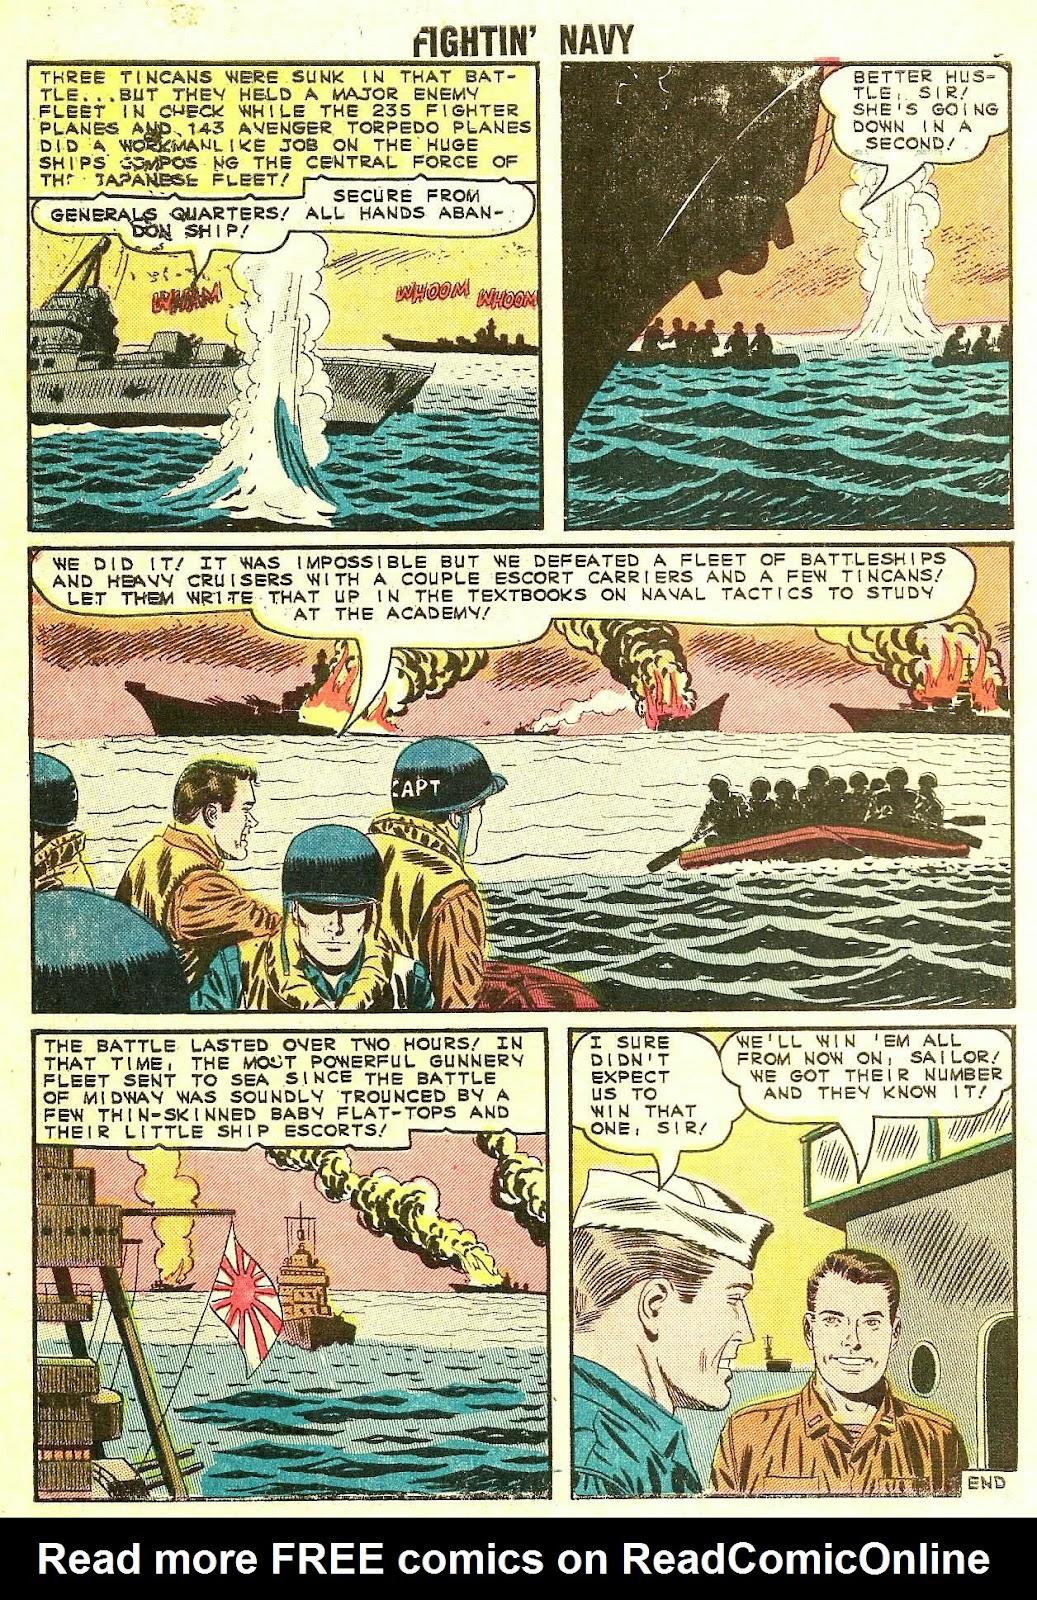 Read online Fightin' Navy comic -  Issue #119 - 10